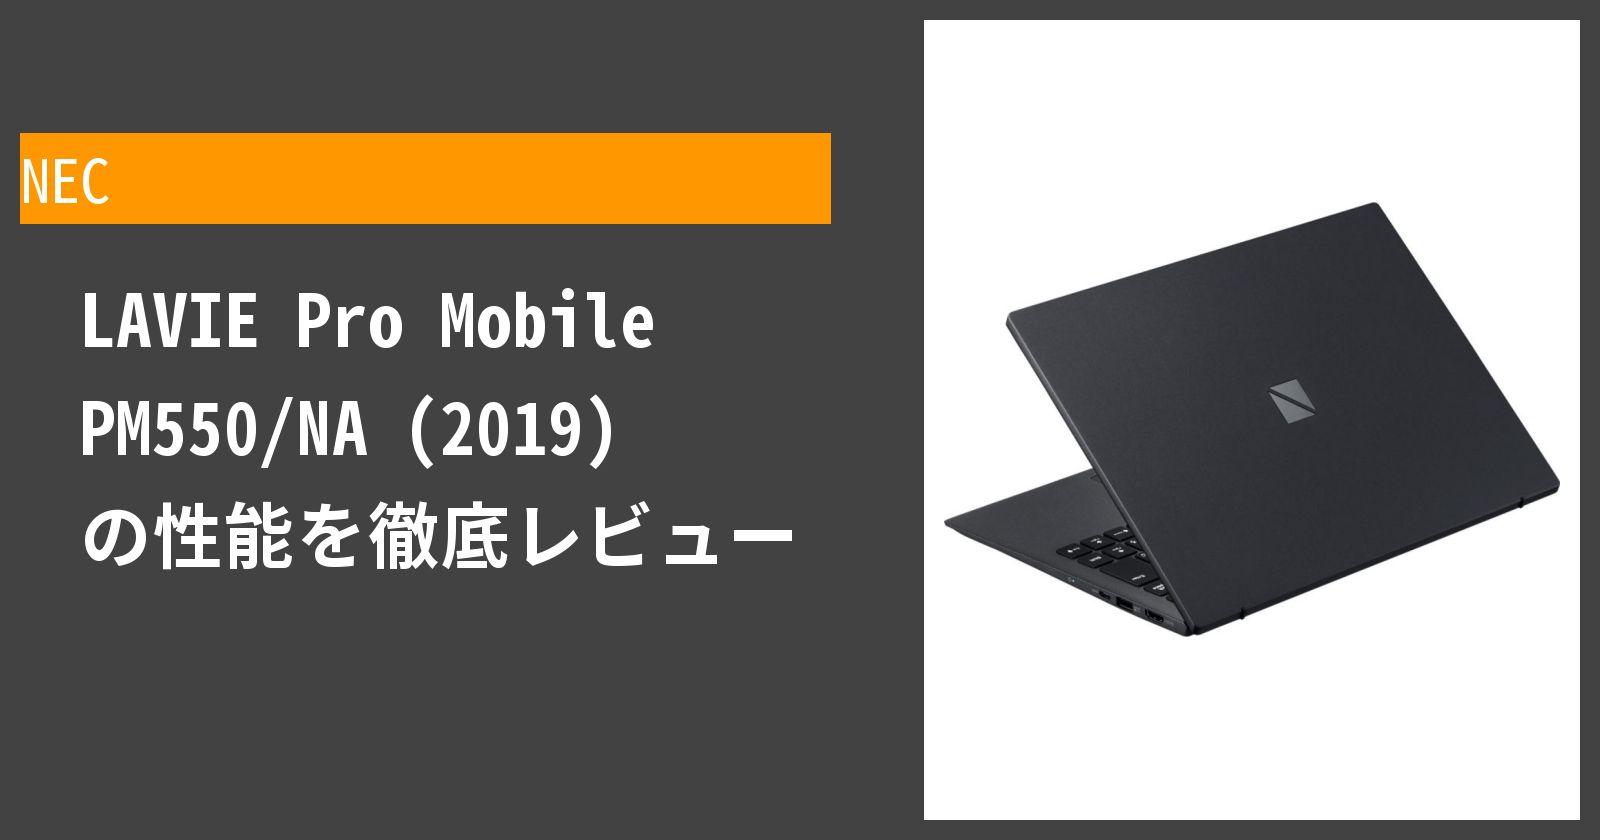 LAVIE Pro Mobile PM550/NA (2019) の性能を徹底レビュー